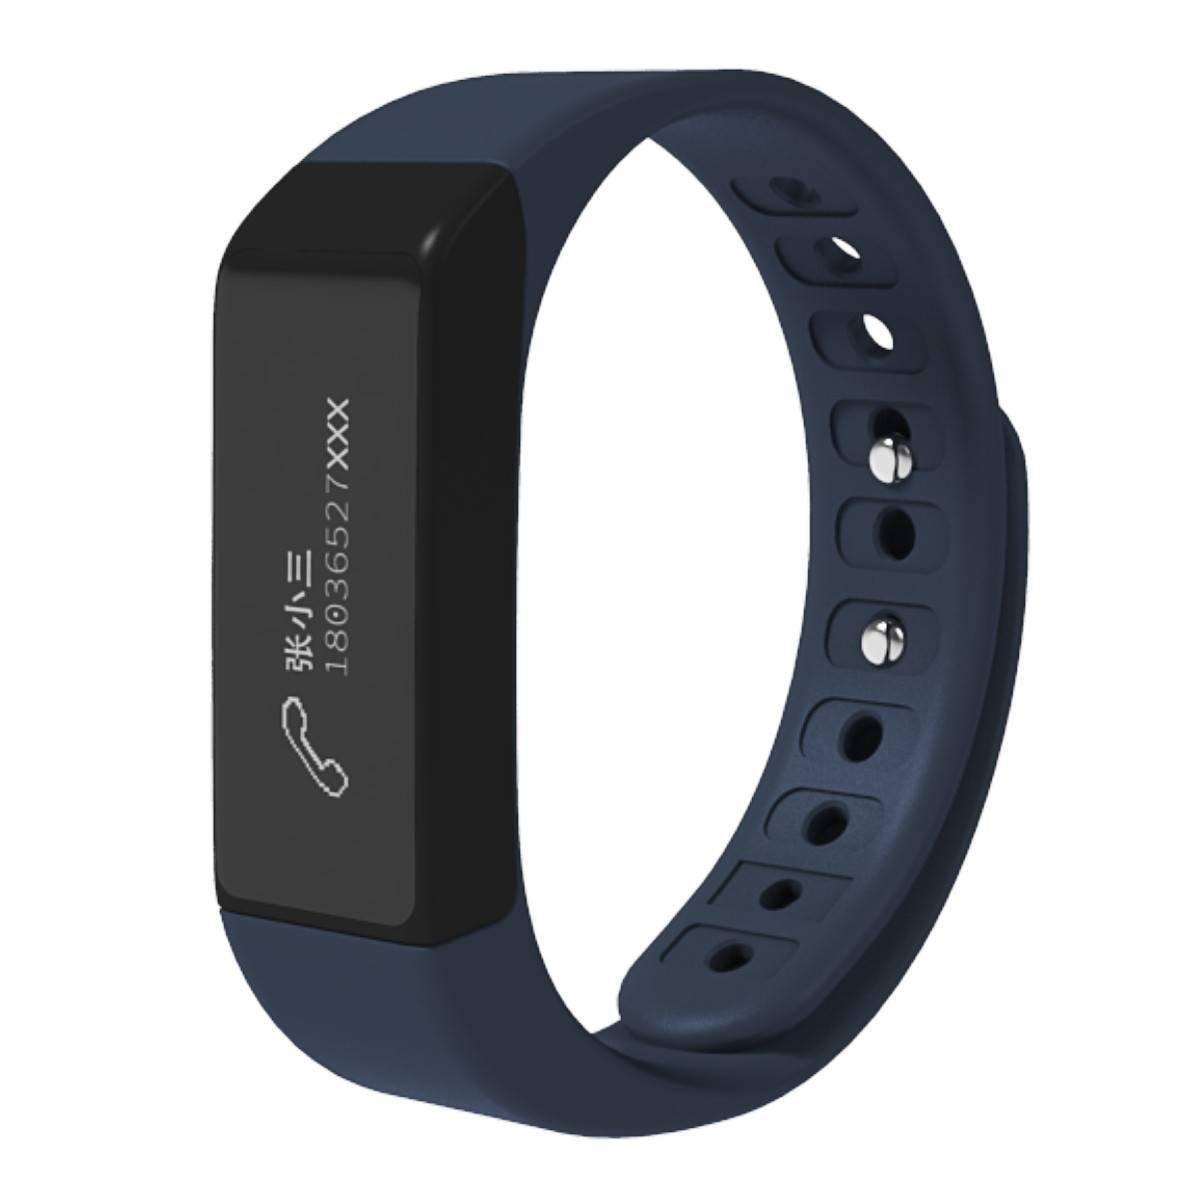 EFOSHM Wireless Activity Sleep Monitor Pedometer